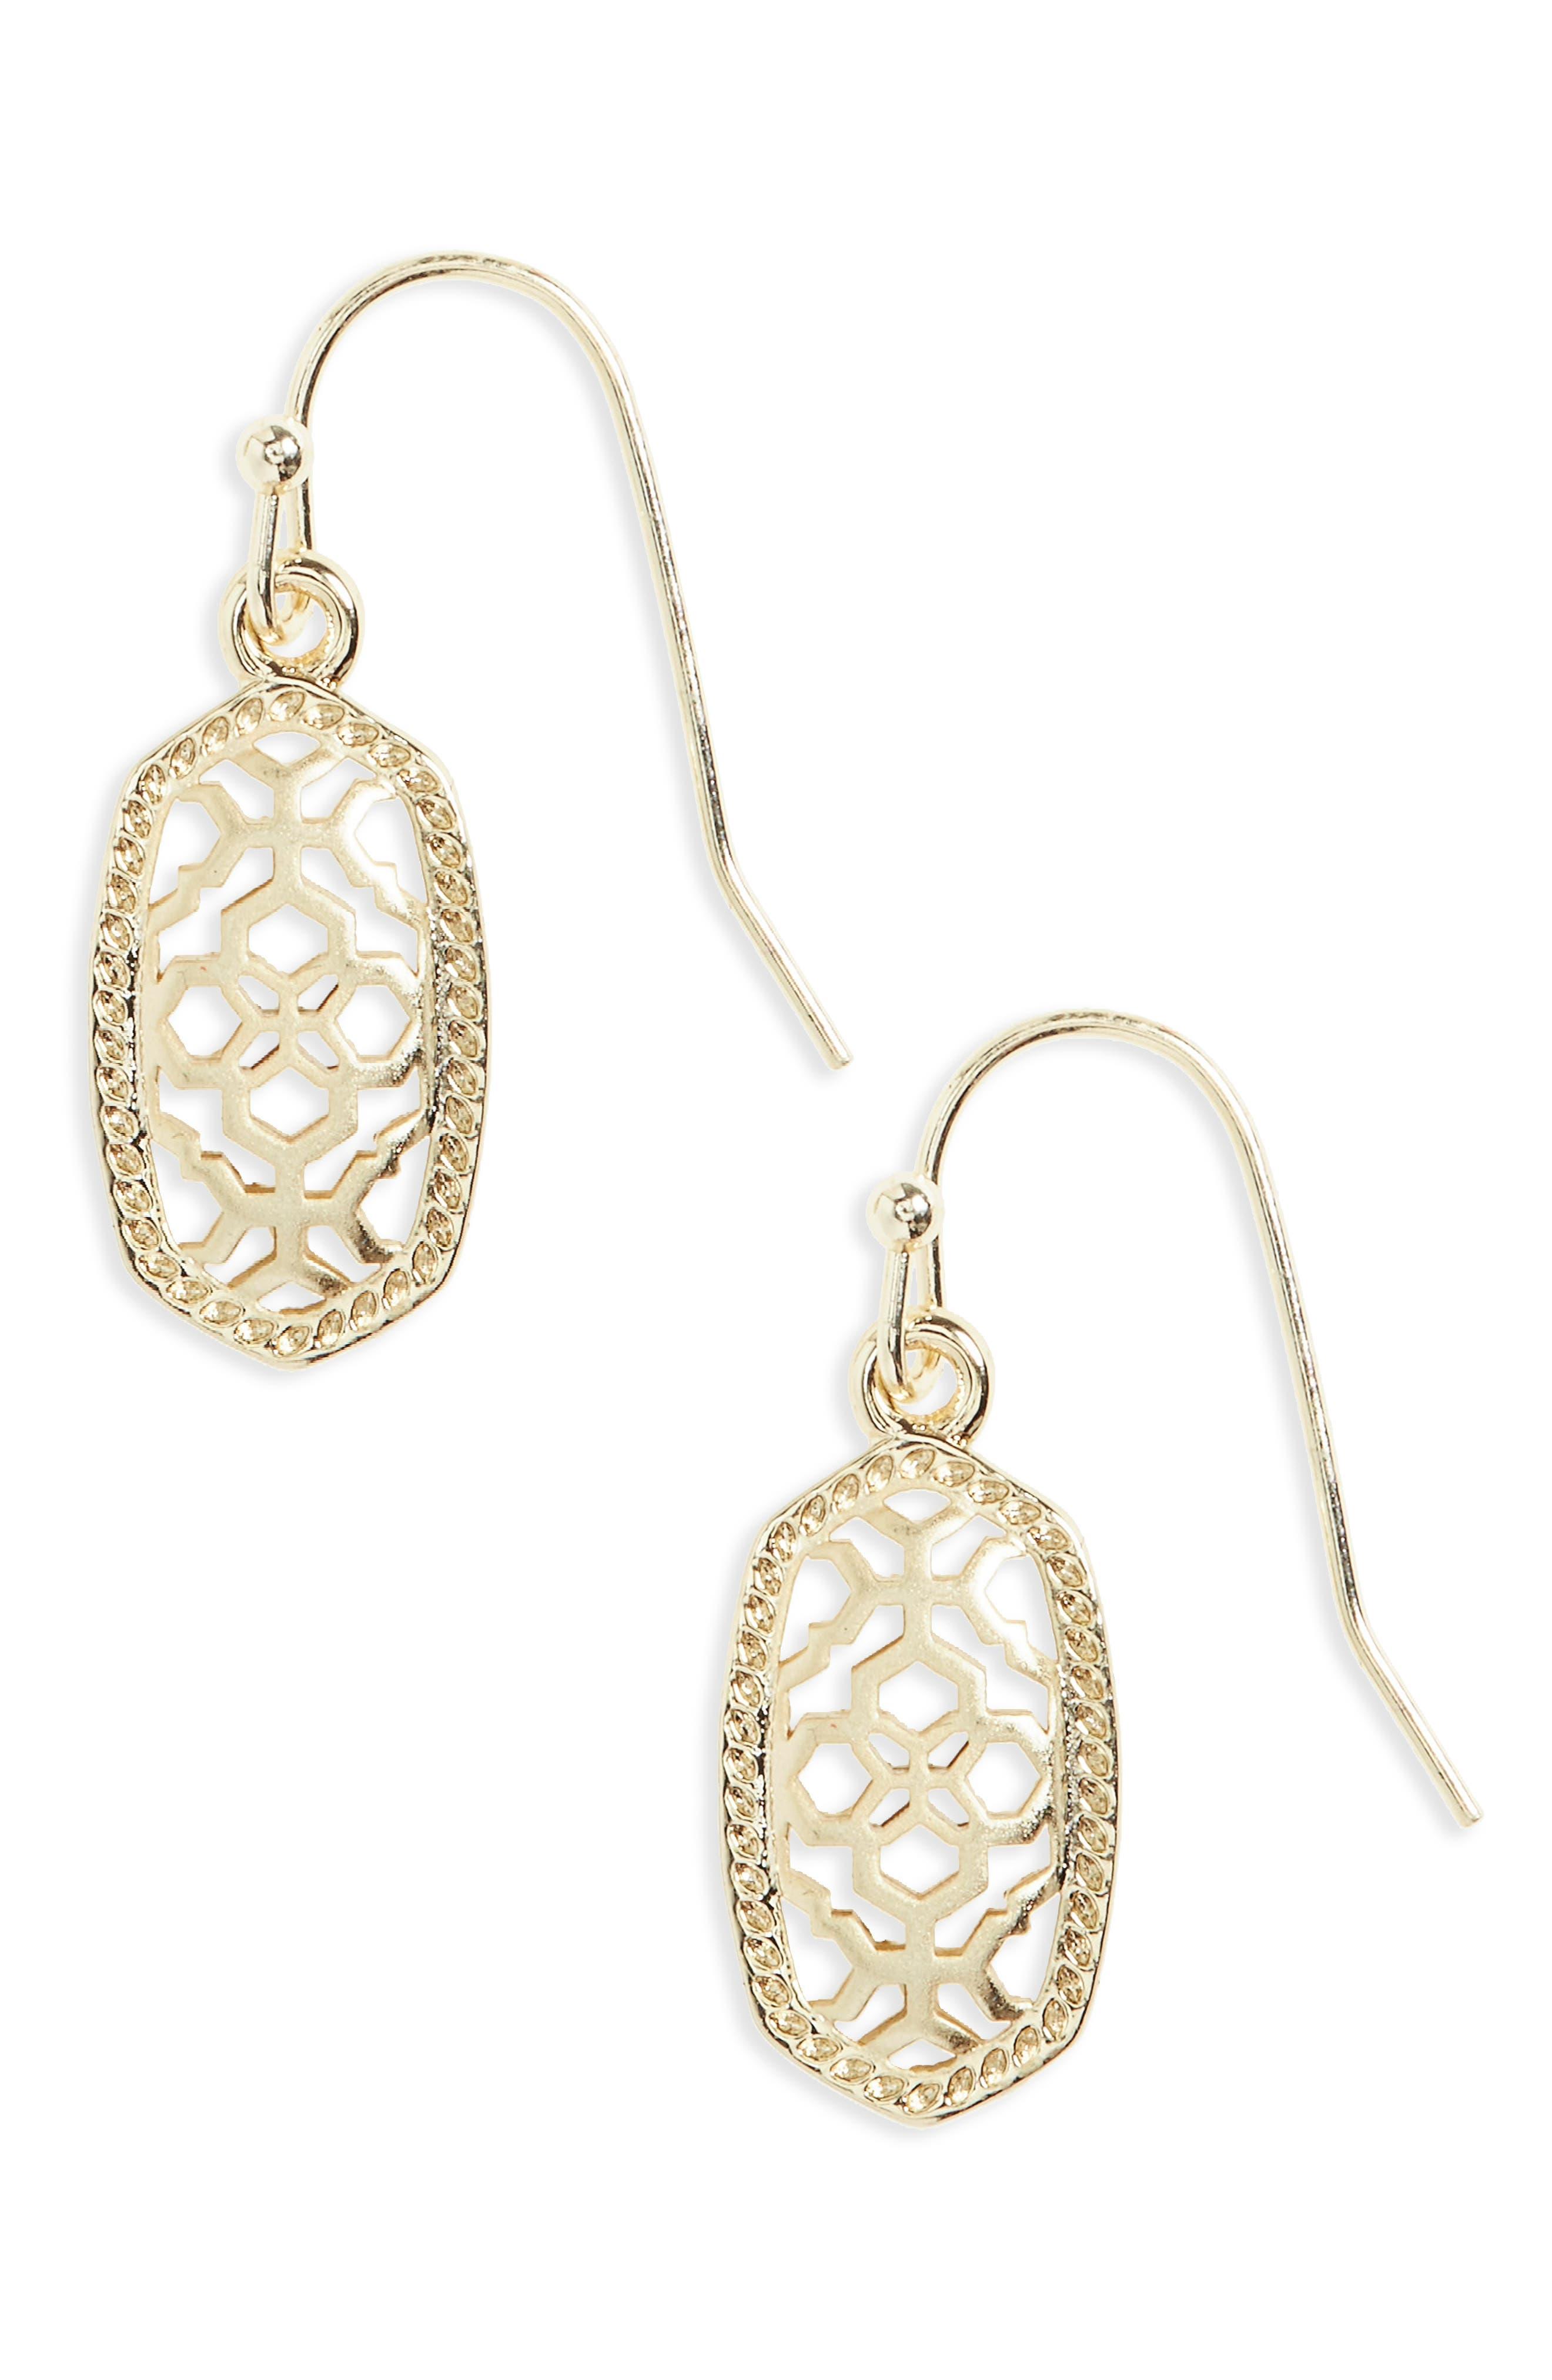 Lee Small Drop Earrings,                             Main thumbnail 1, color,                             Gold Metal Filigree